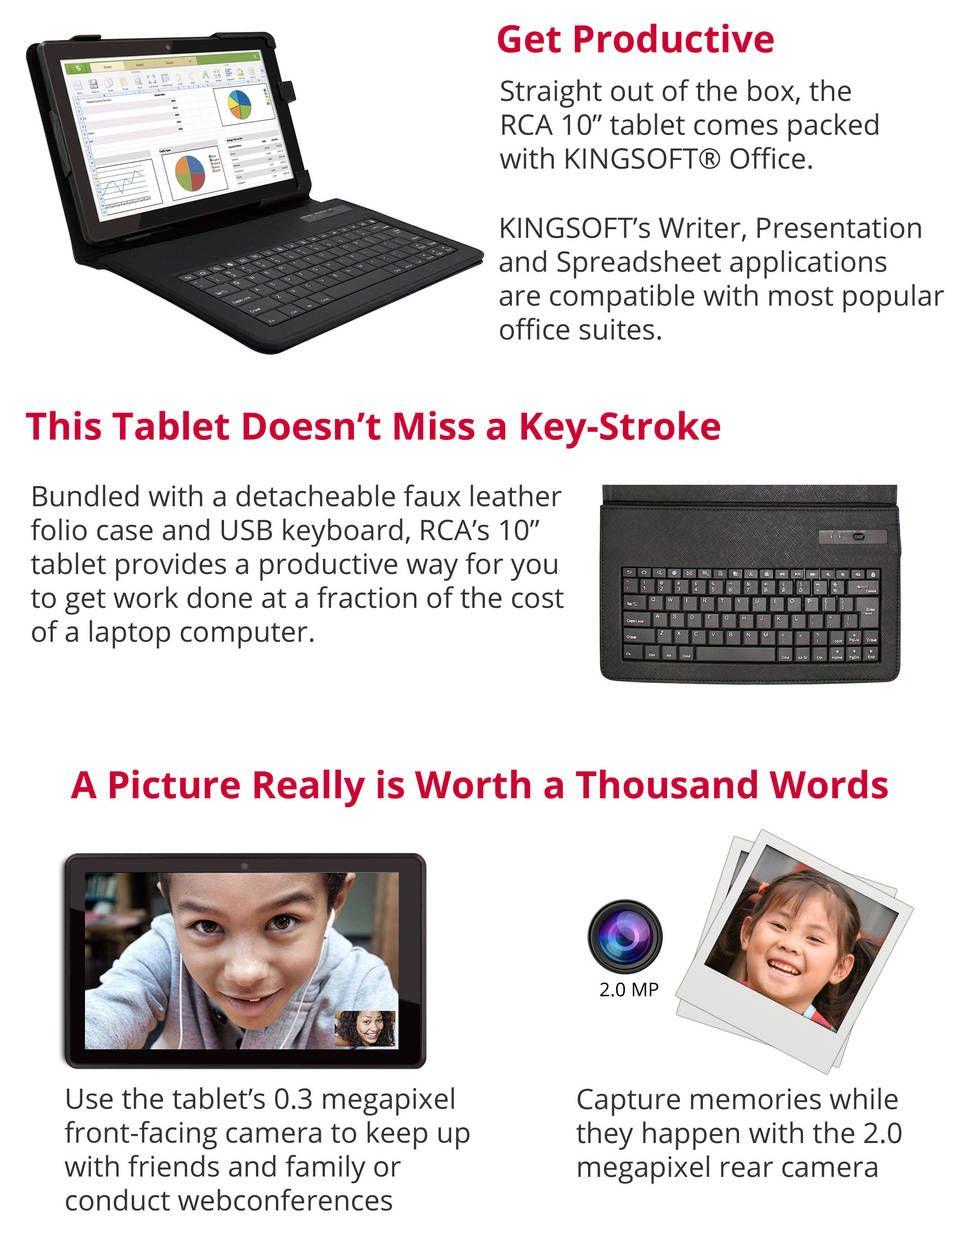 "RCA 10"" tablet w/USB keyboard and folio case For Sheila"